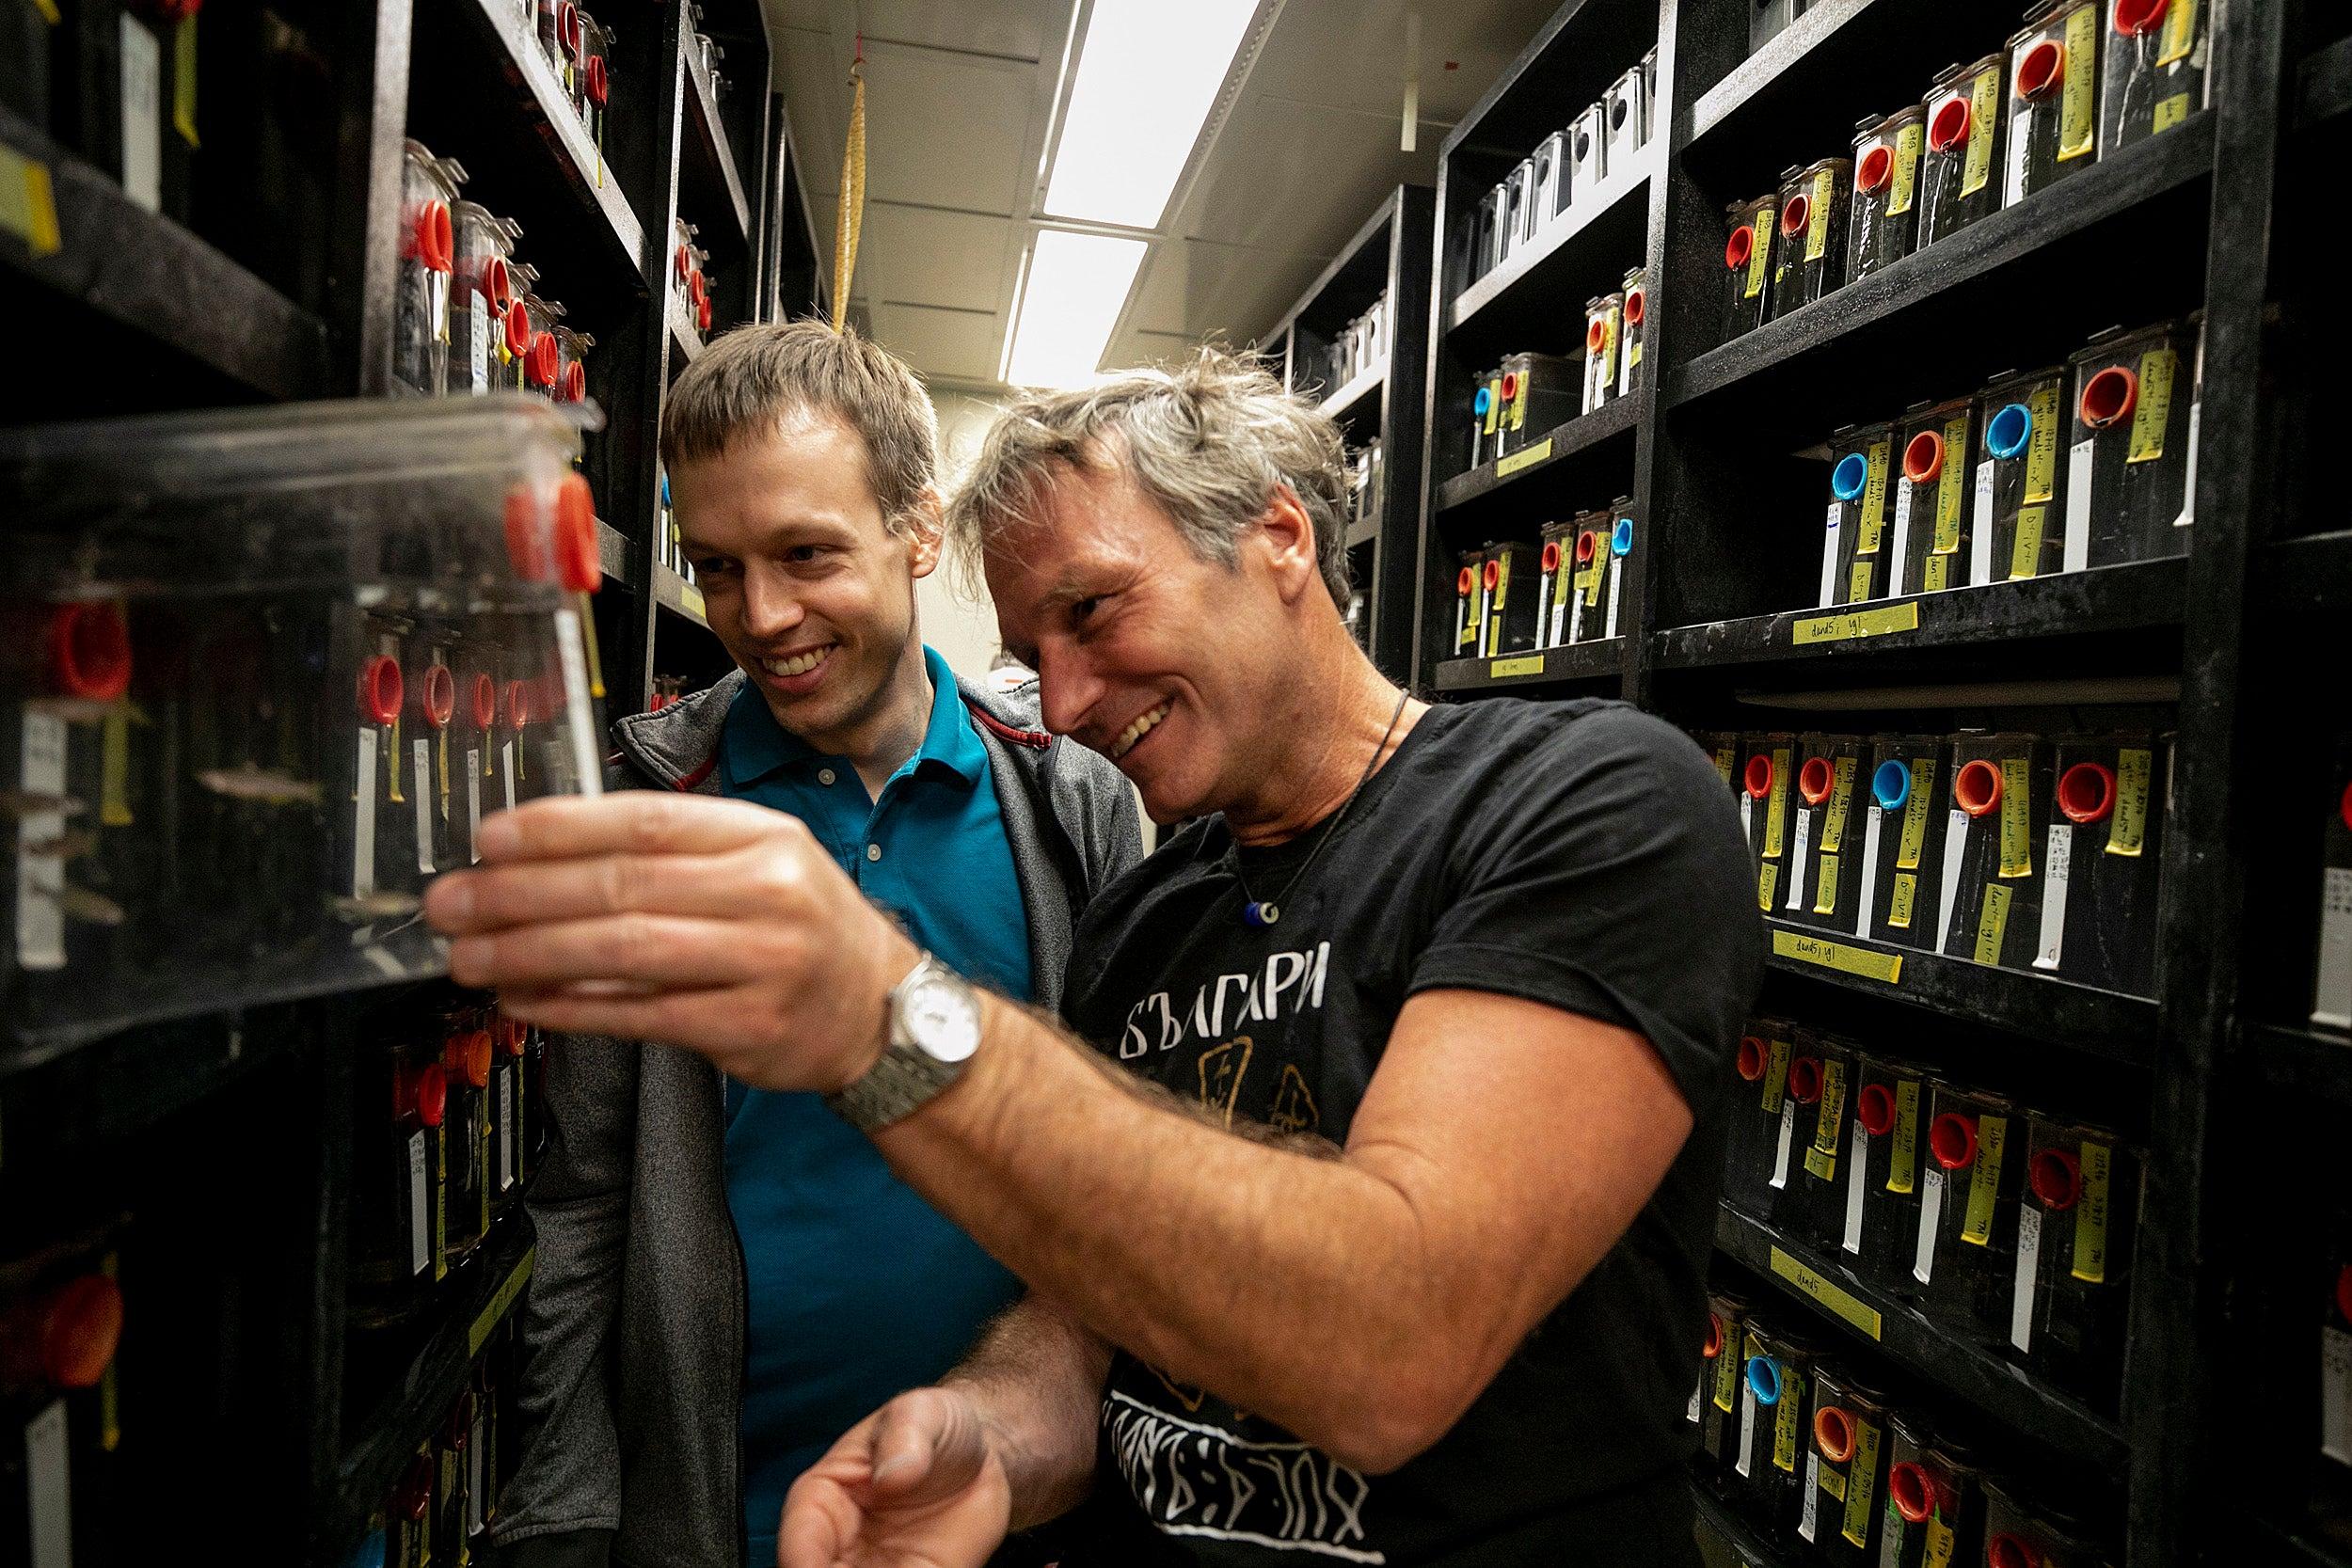 Martin Haesemeyer, on left, and Florian Engerts